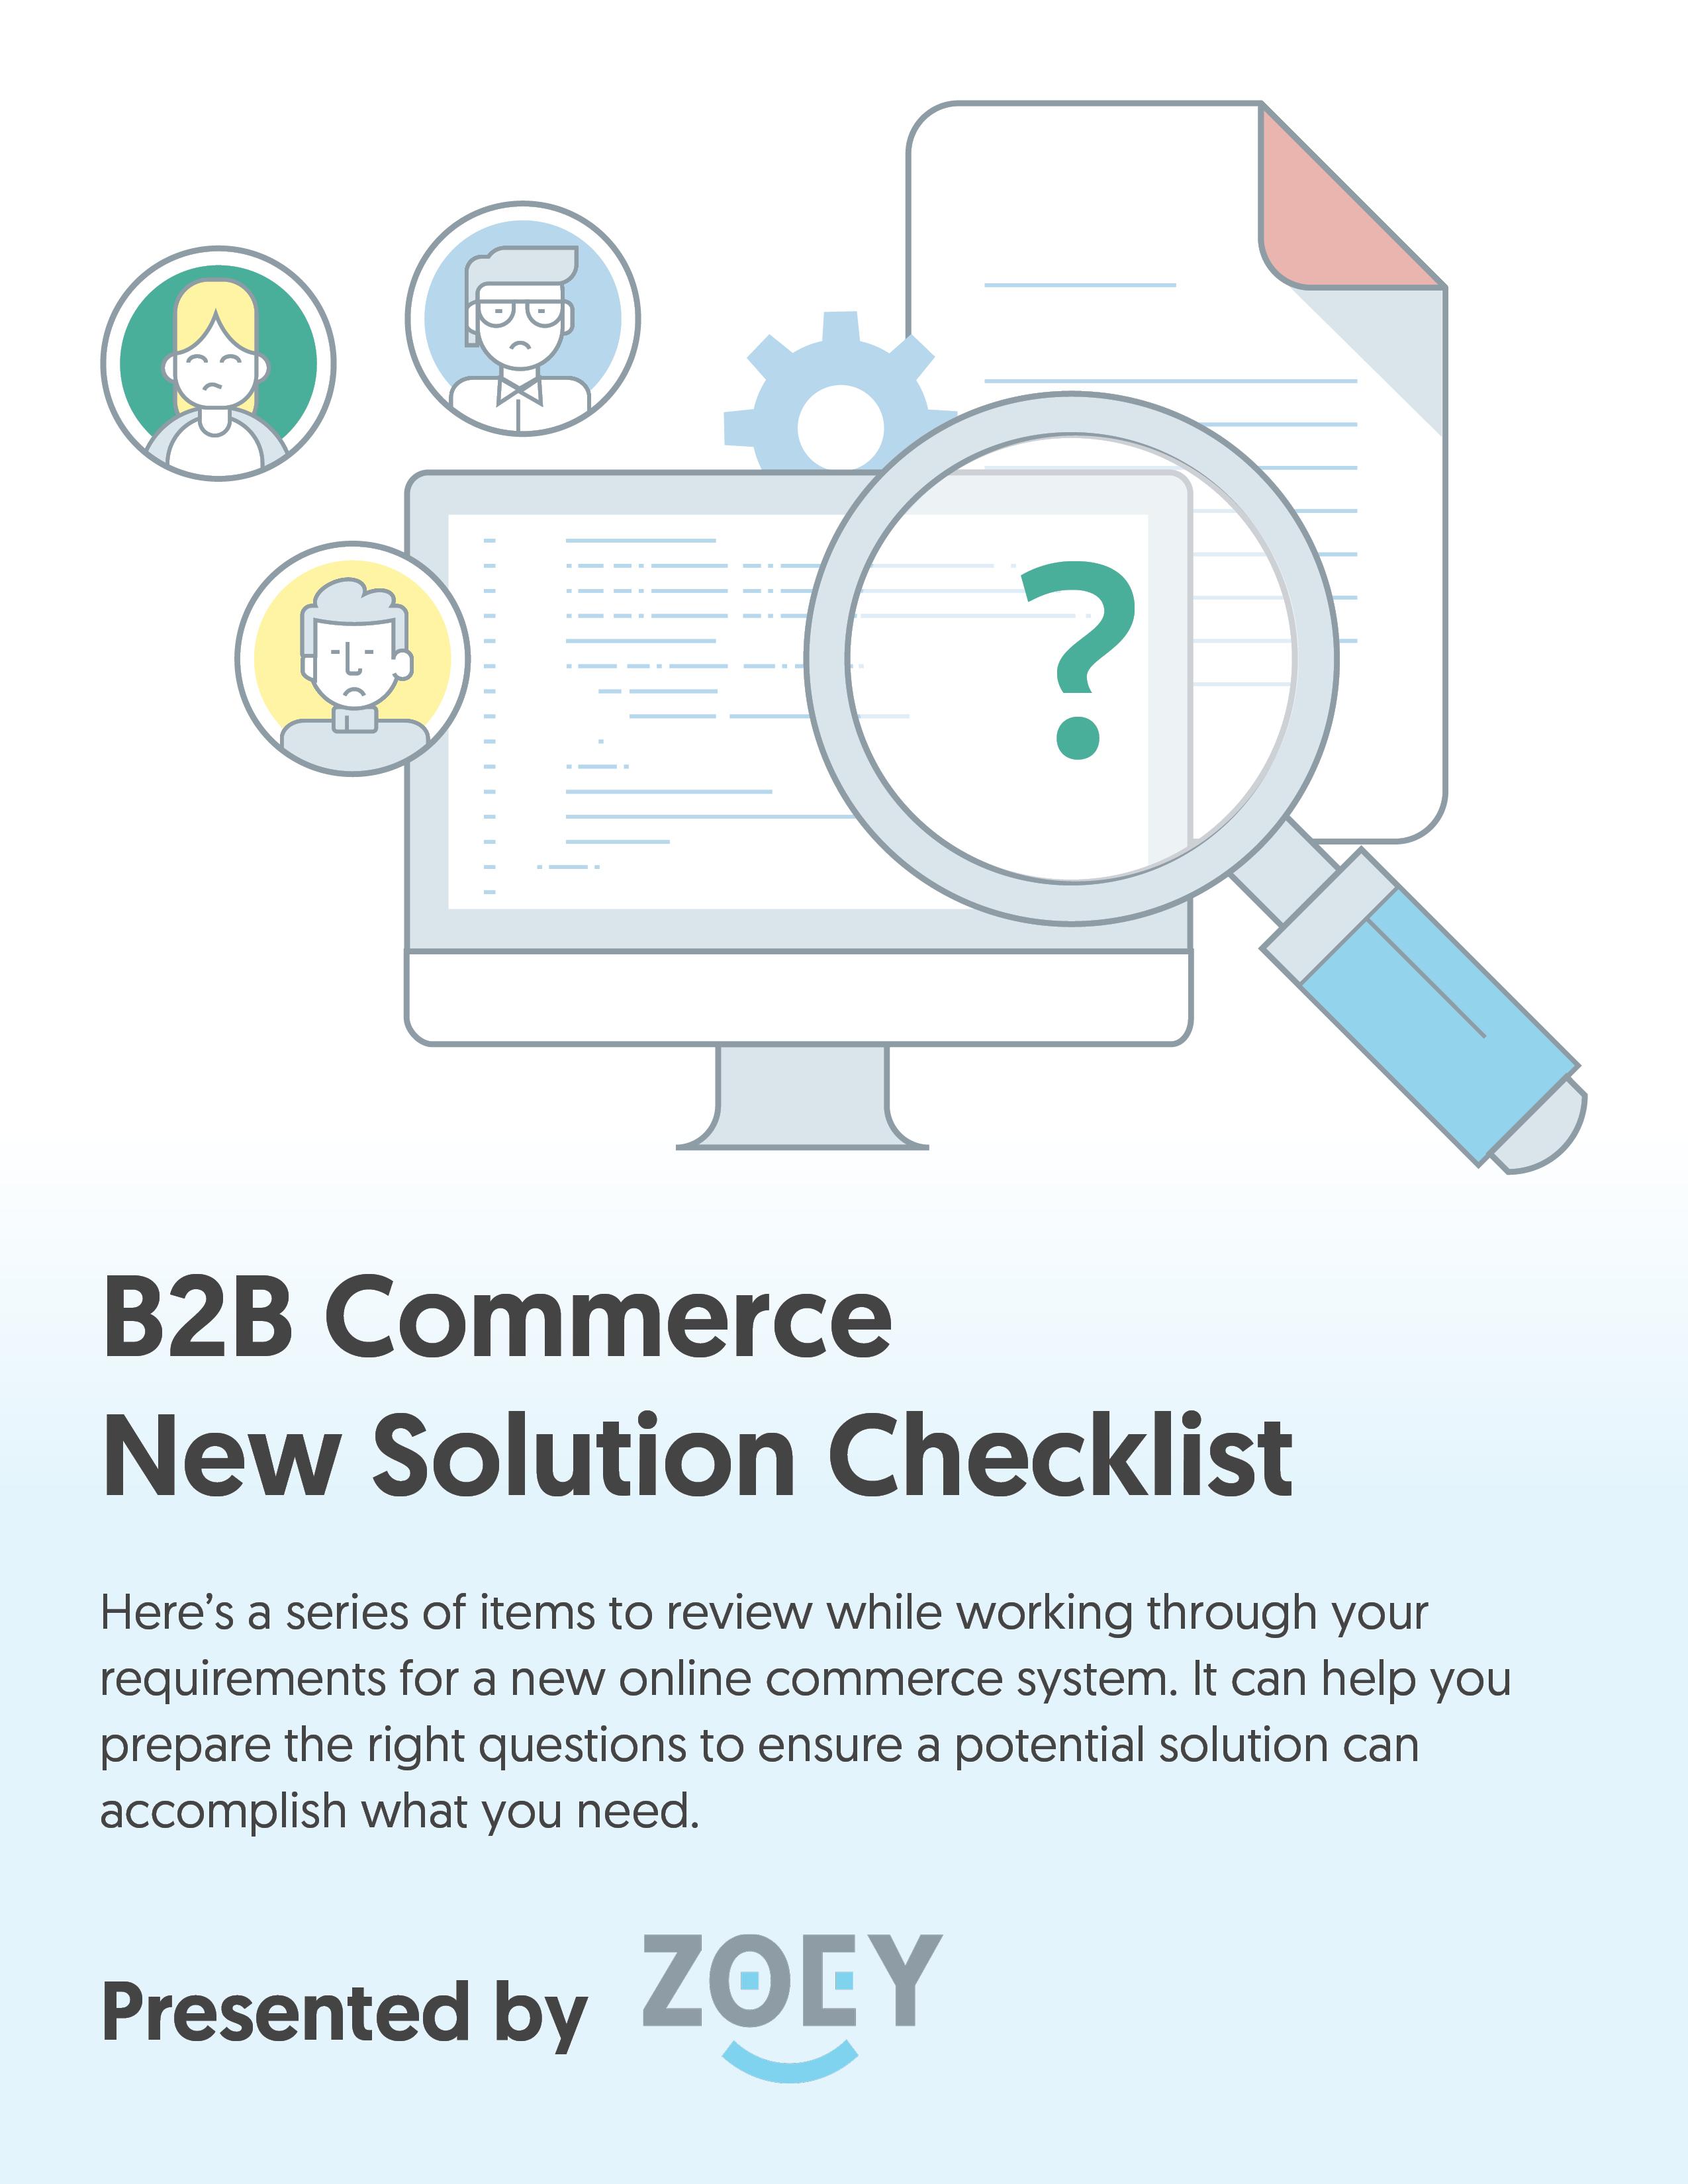 B2B eCommerce Checklist 2020 Rebrand